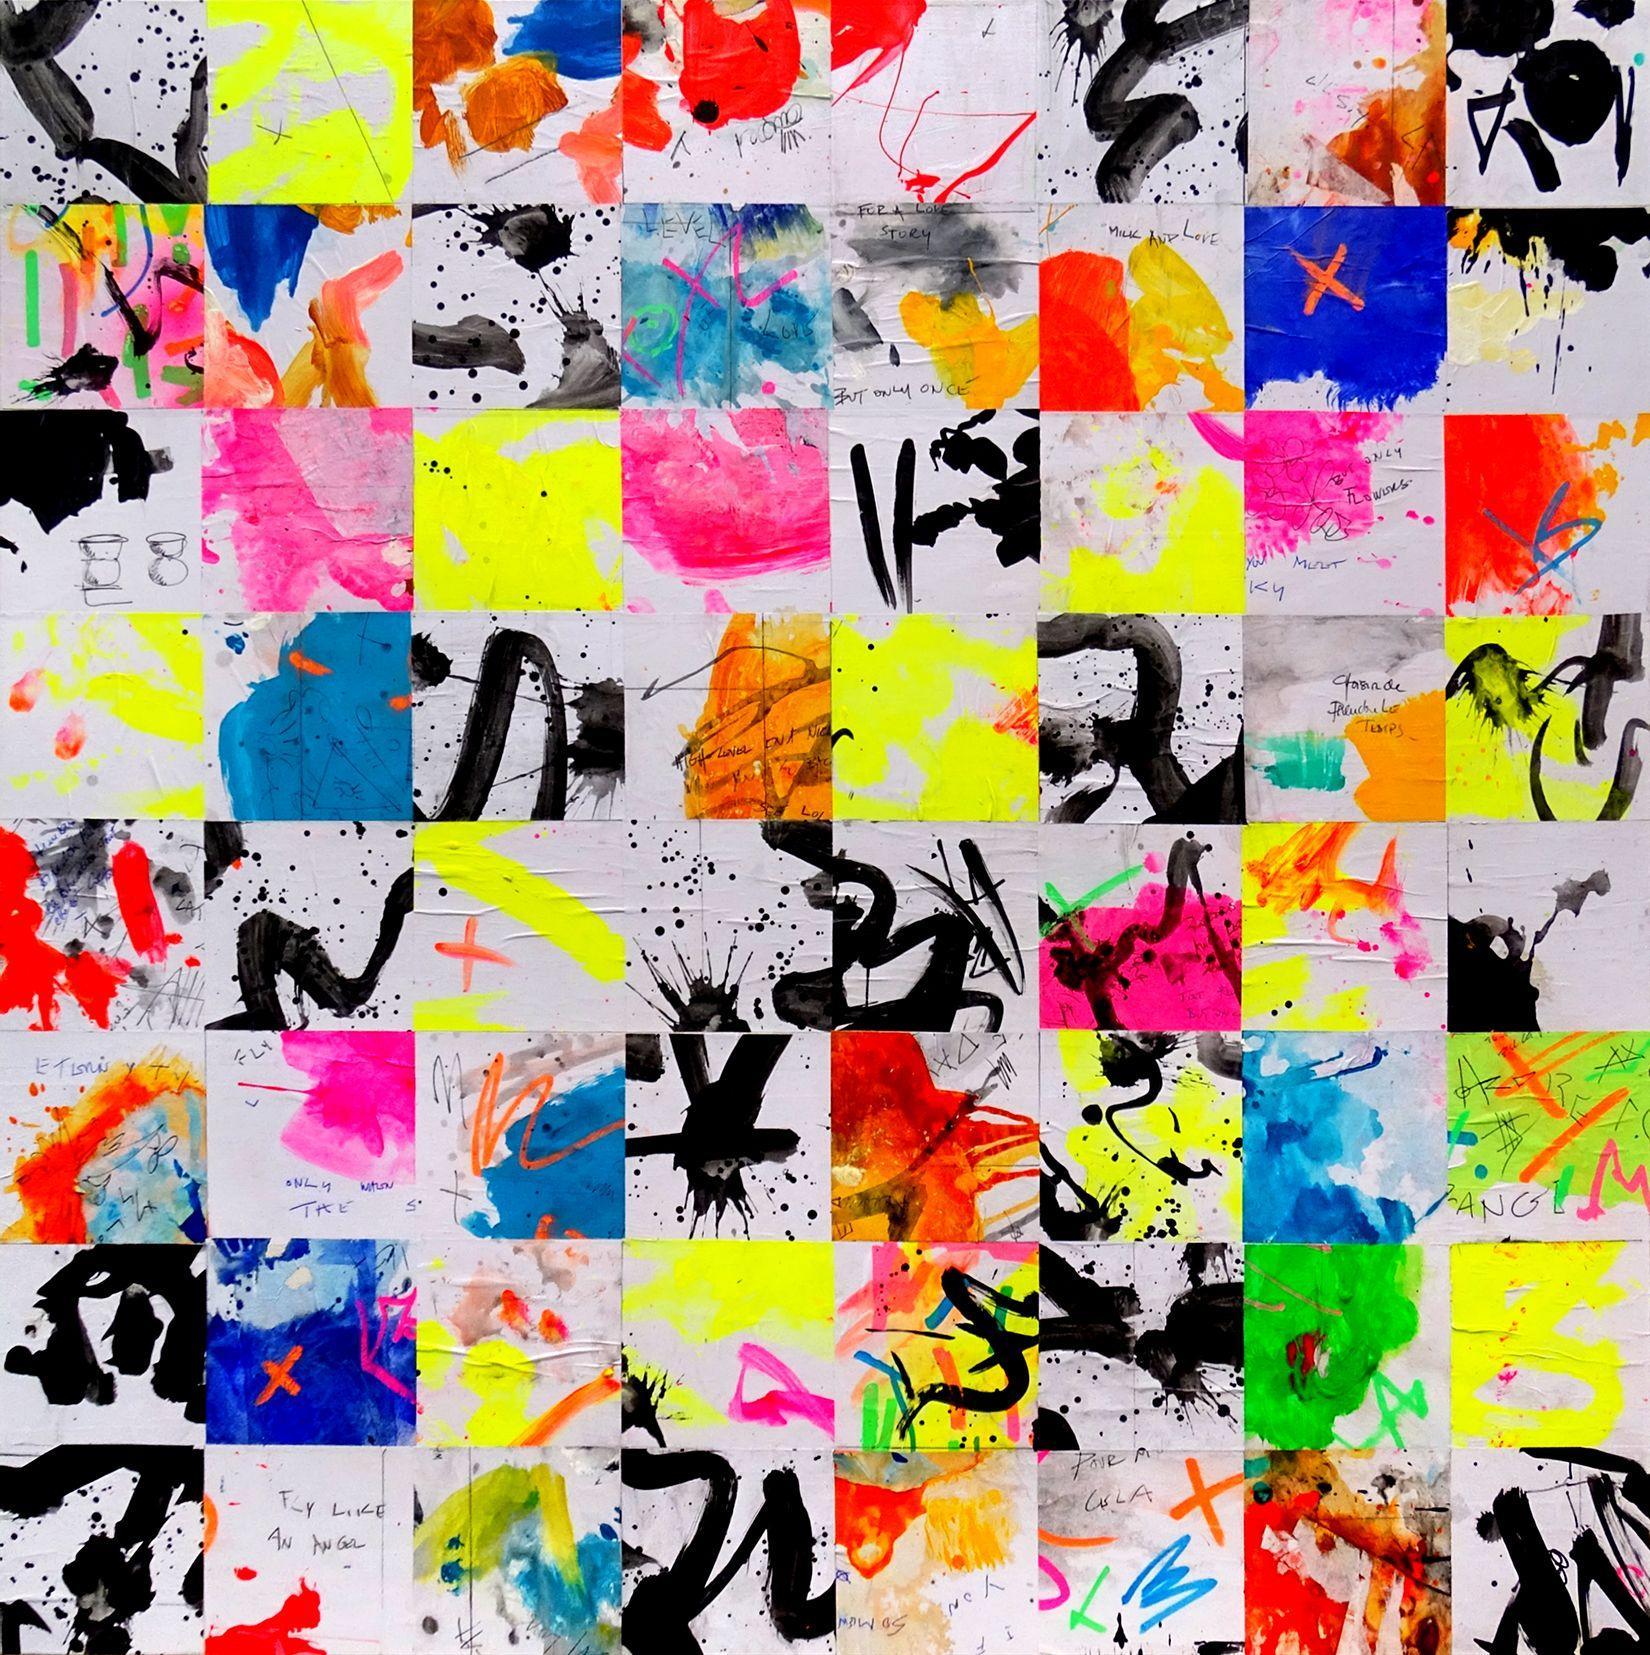 Tehos - Champ de perception chromatique A-07, Mixed Media on Canvas